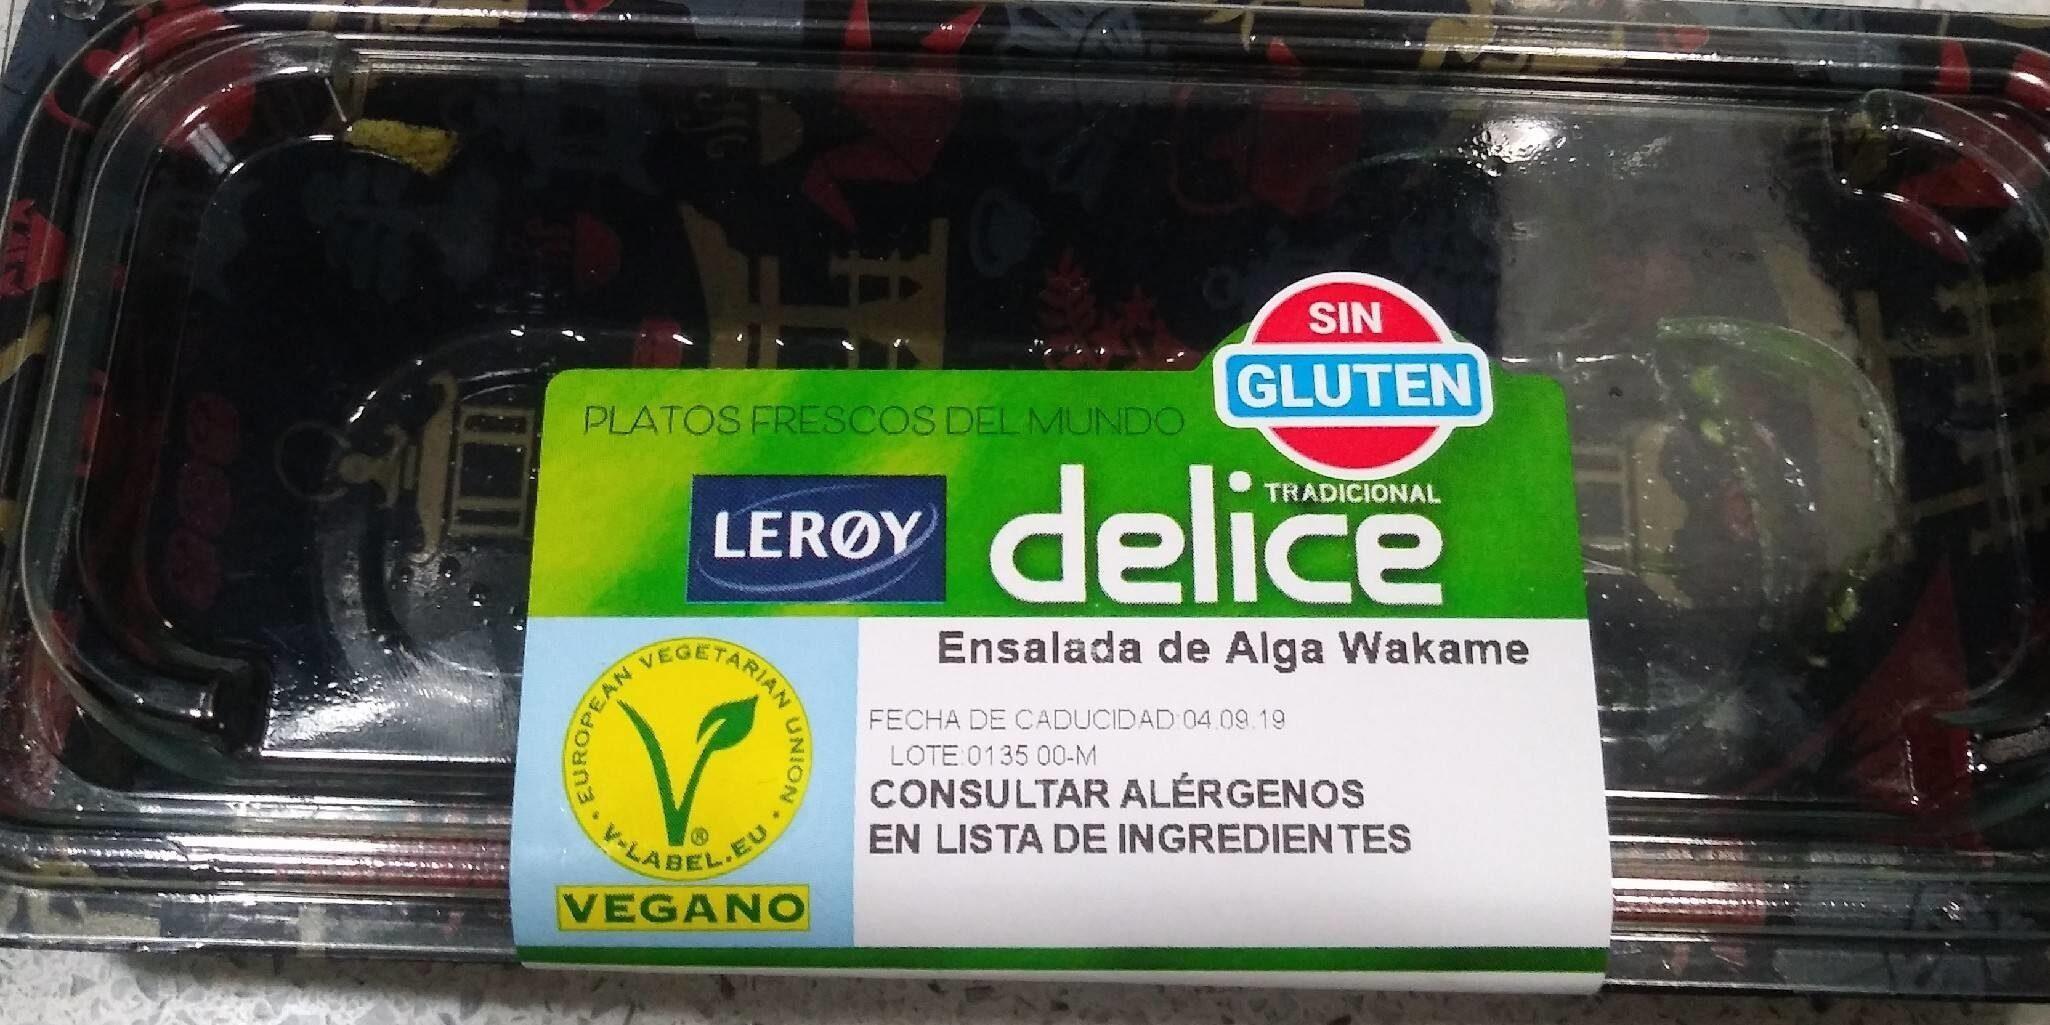 Ensalada alga wakame - Producte